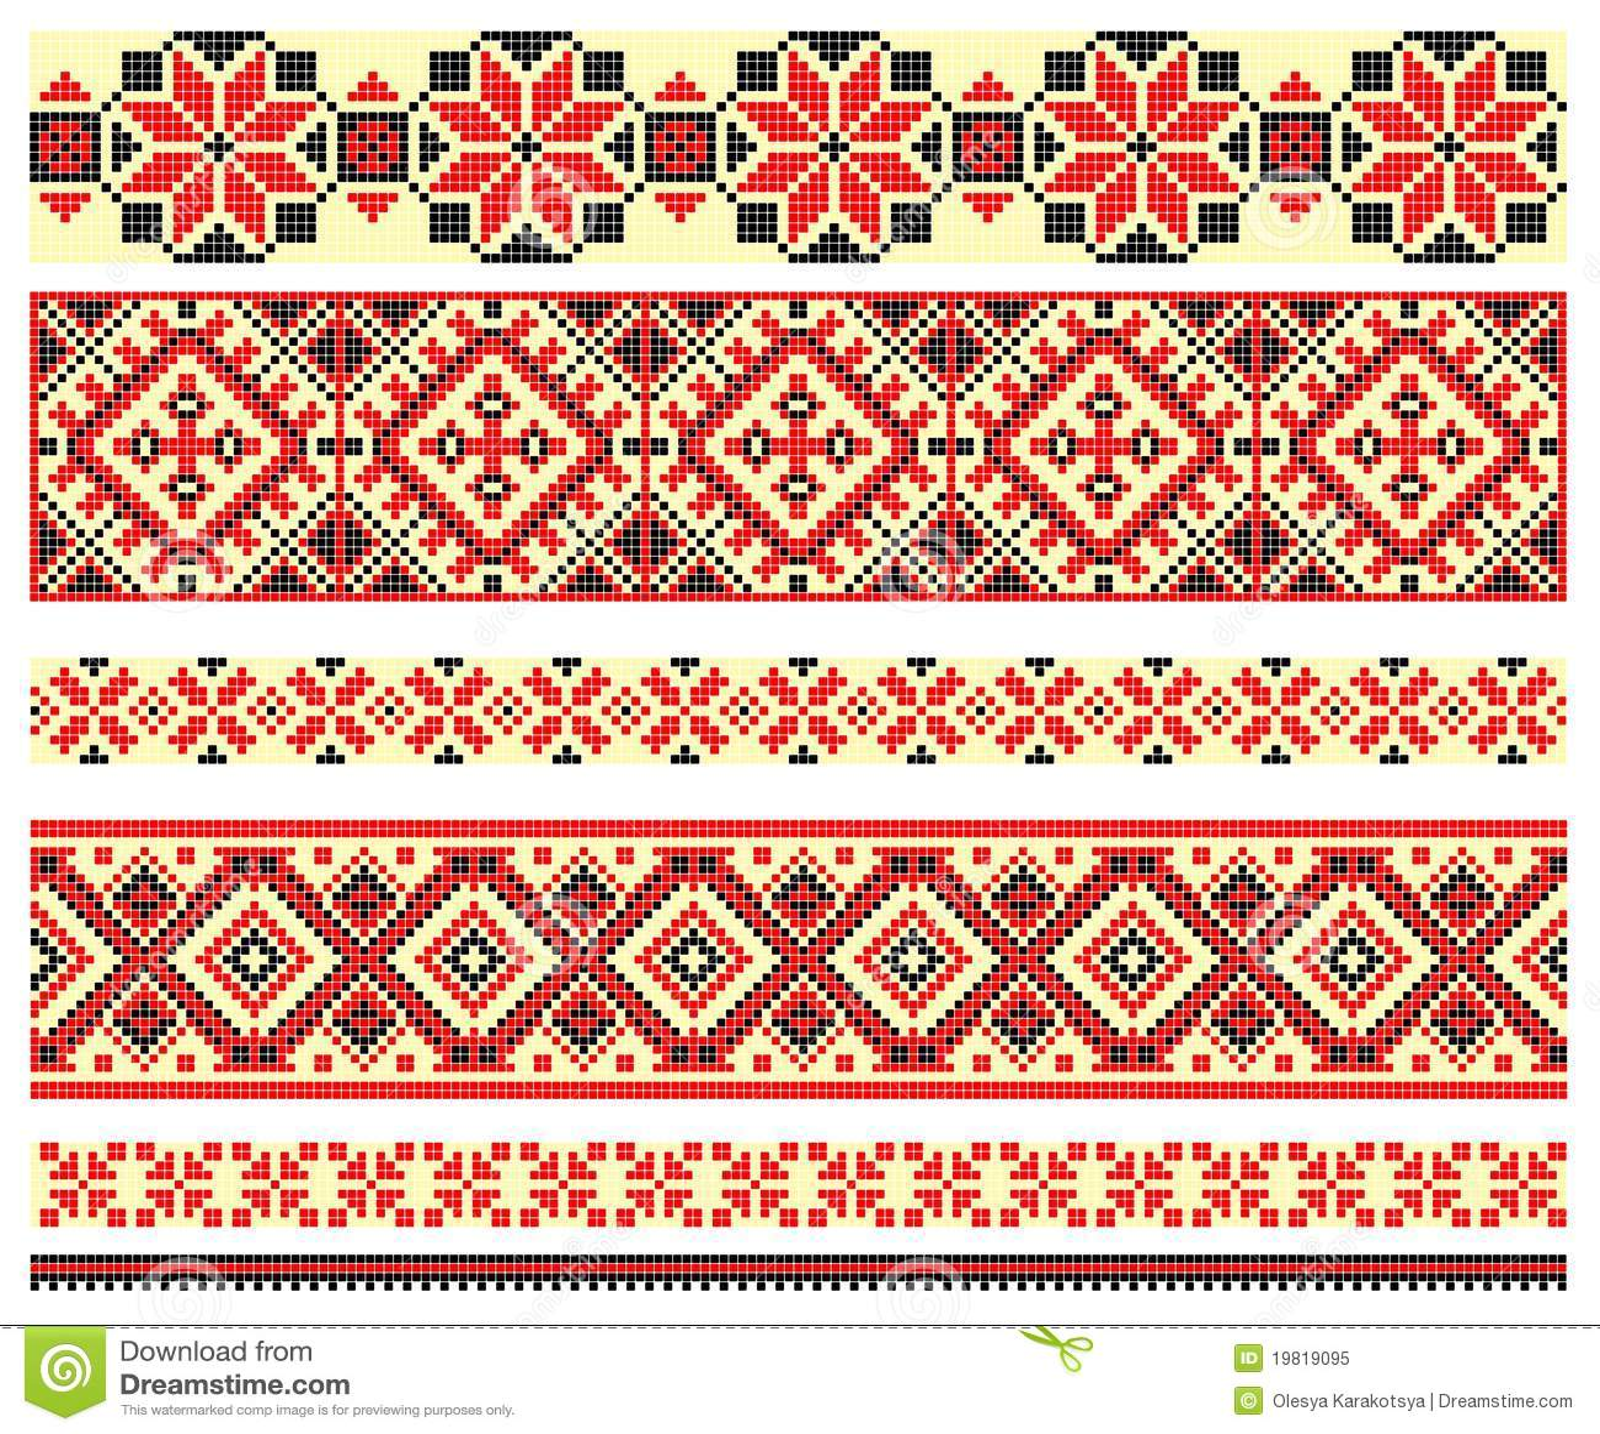 Embroidery cross stitch patterns makaroka embroidery crossstitch pattern royalty free stock photo bankloansurffo Gallery